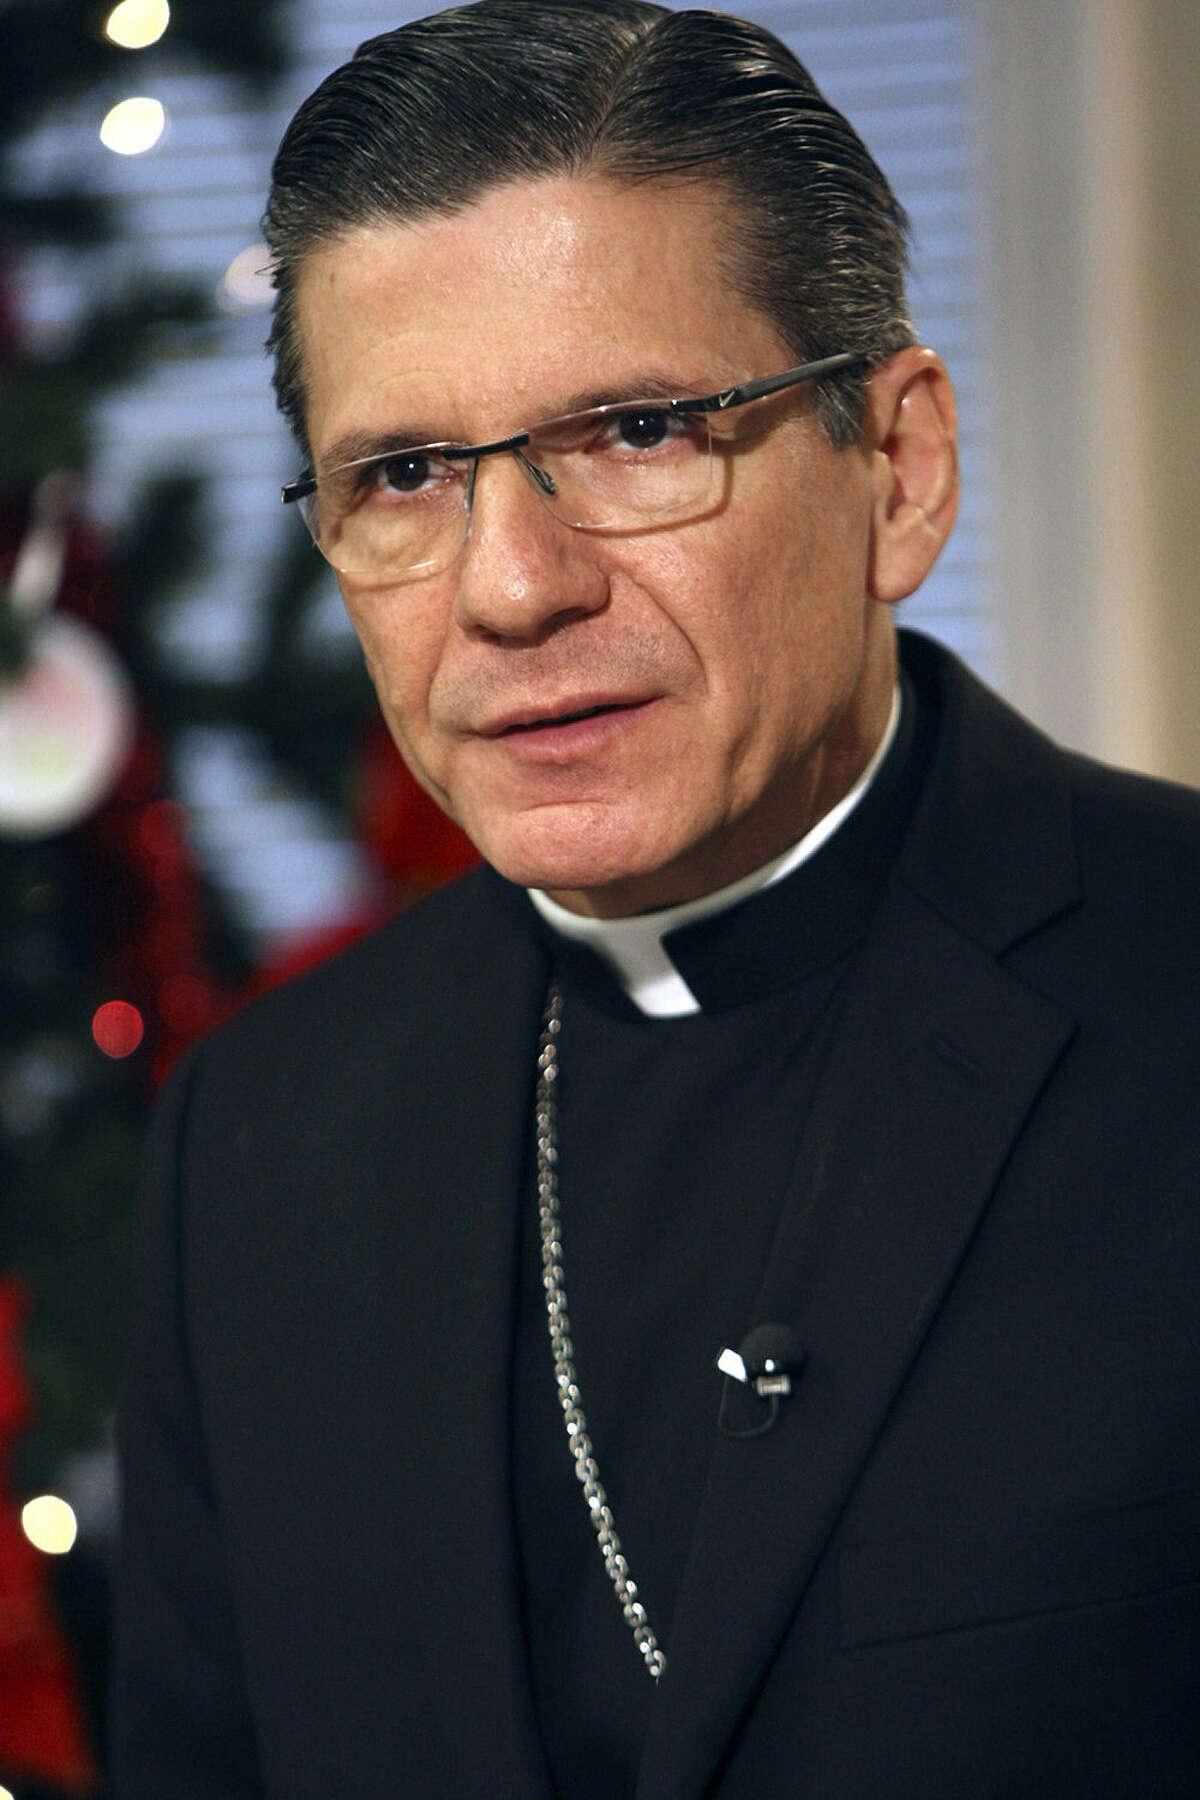 Gustavo García-Siller is San Antonio's Catholic archbishop.